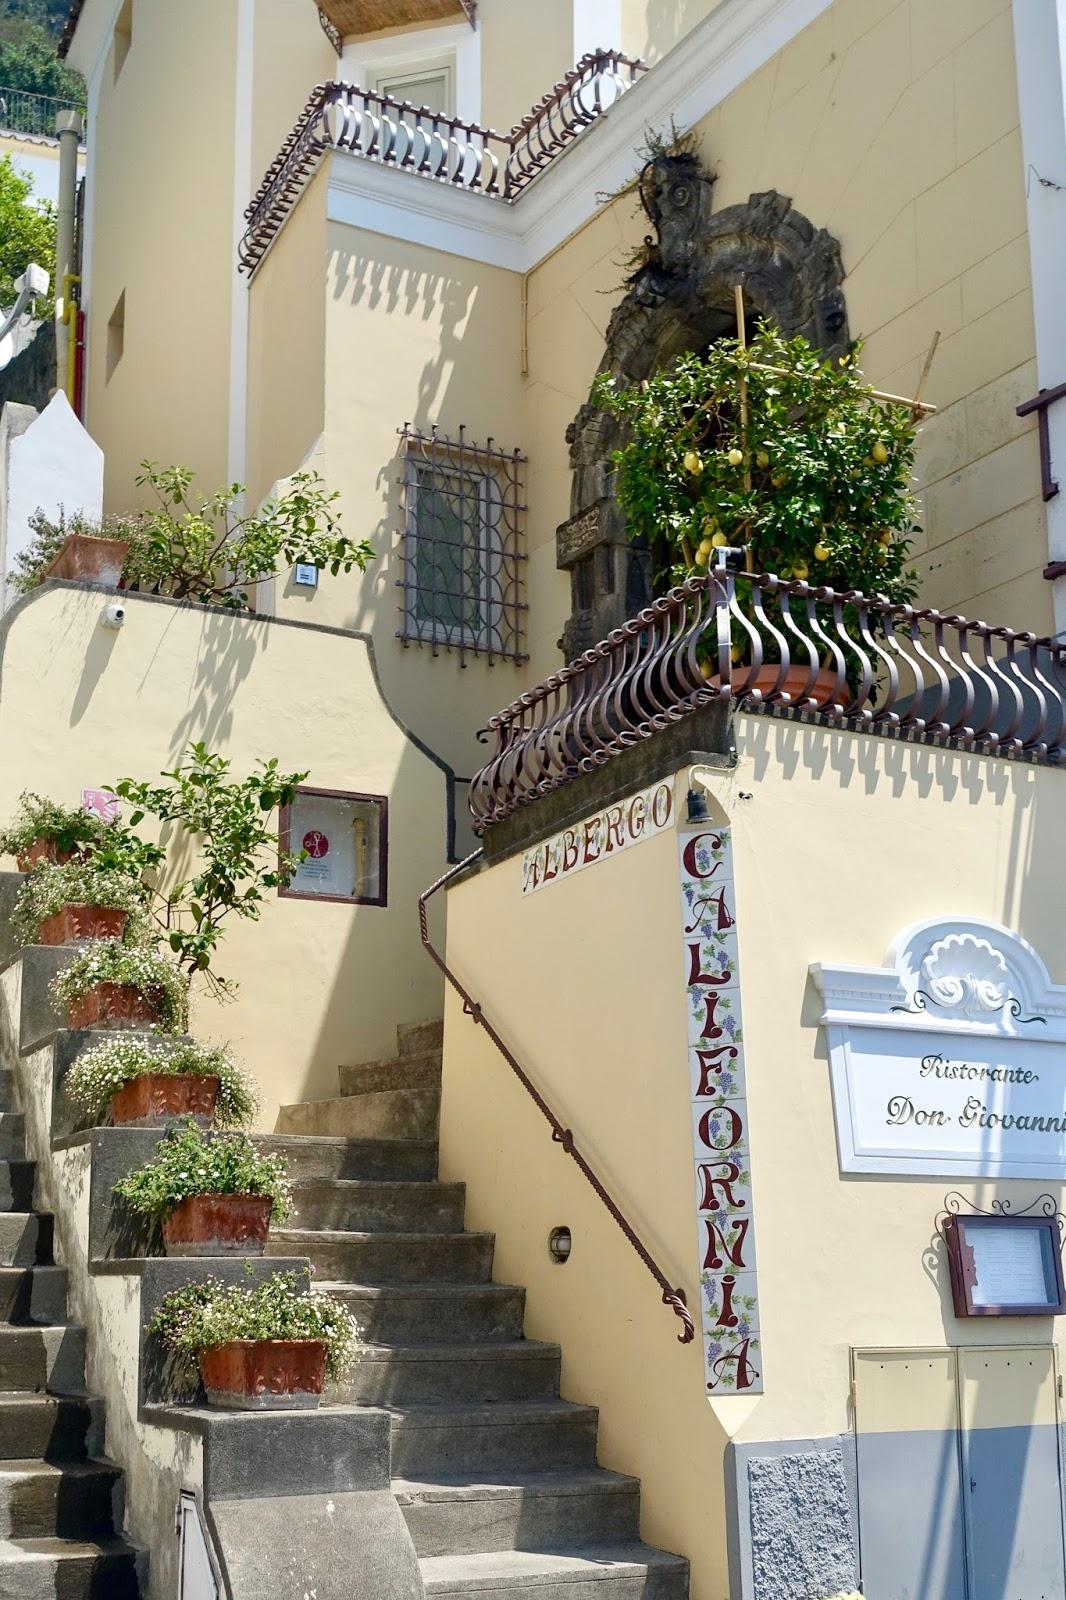 Streets of Positano Italy